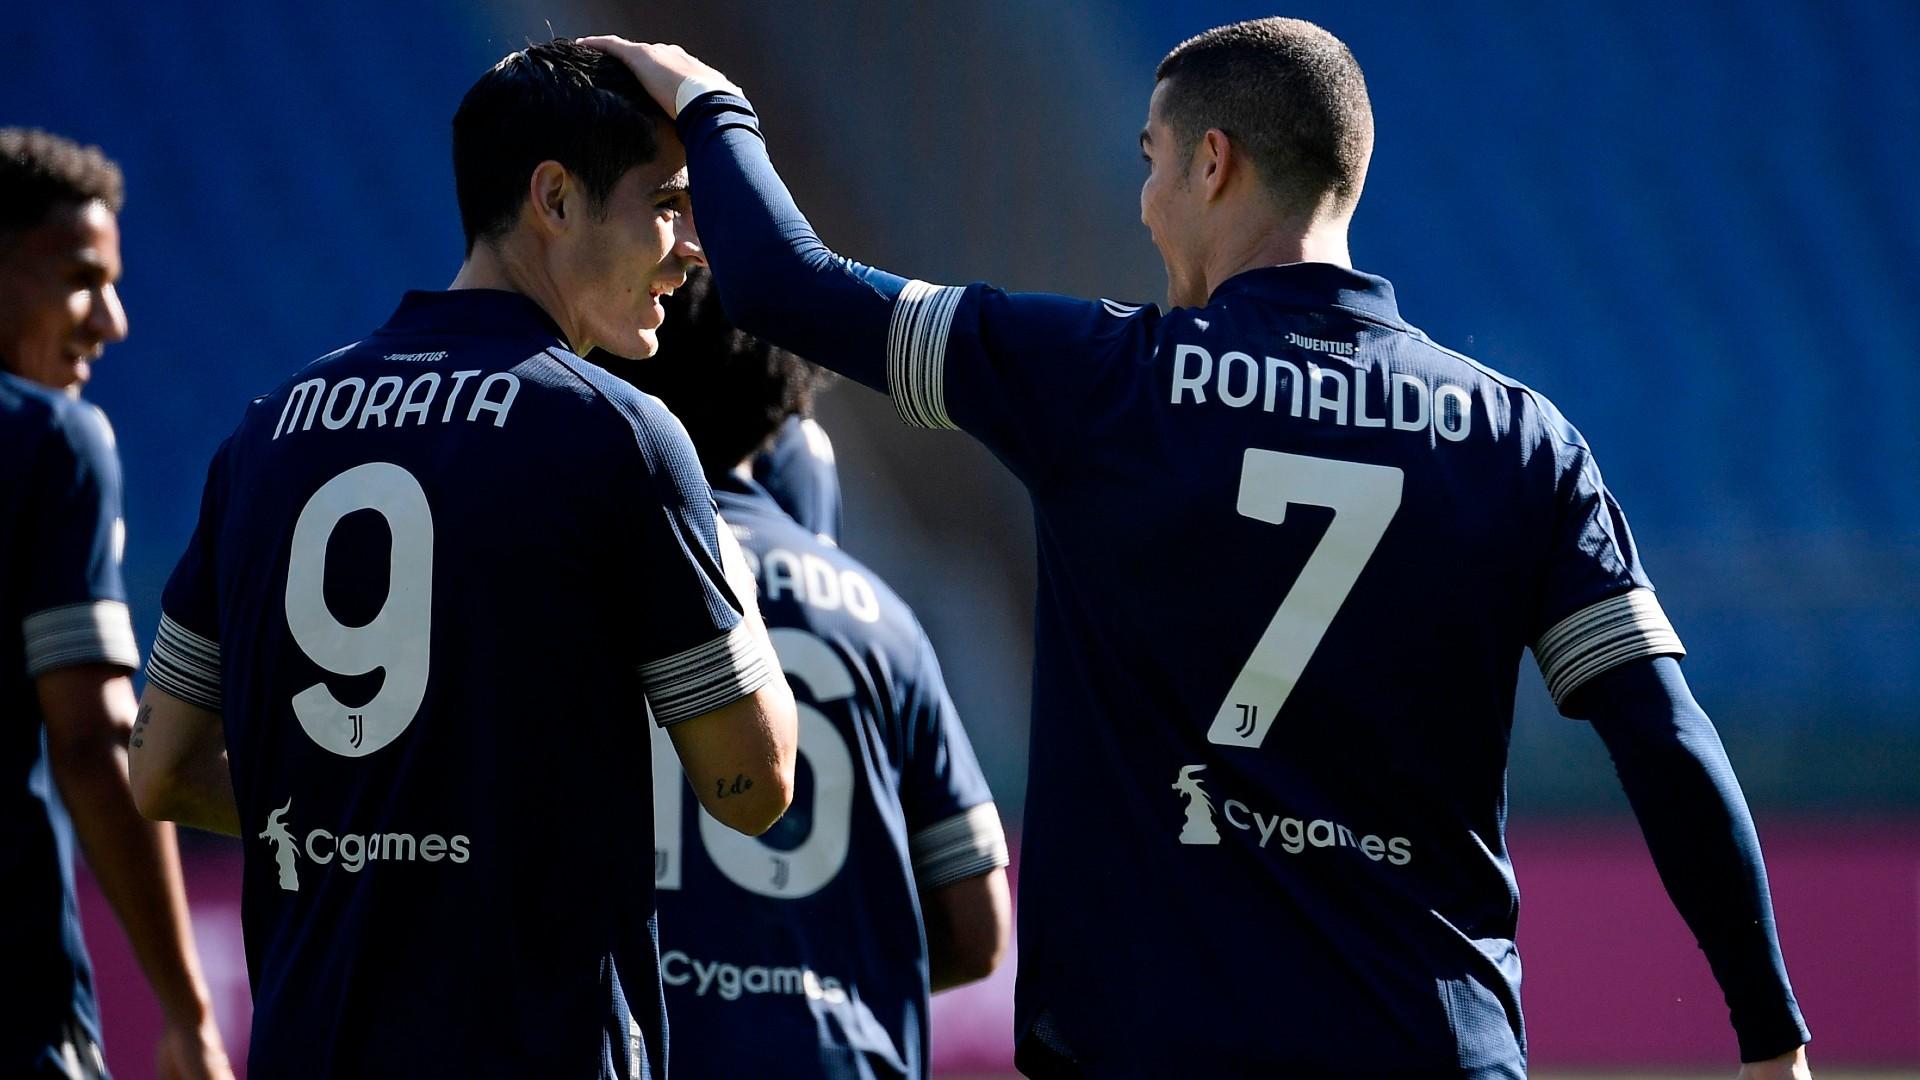 Cristiano Ronaldo-Alvaro Morata Duet Paten Juventus, Andrea Pirlo Setop  Eksperimen | Goal.com